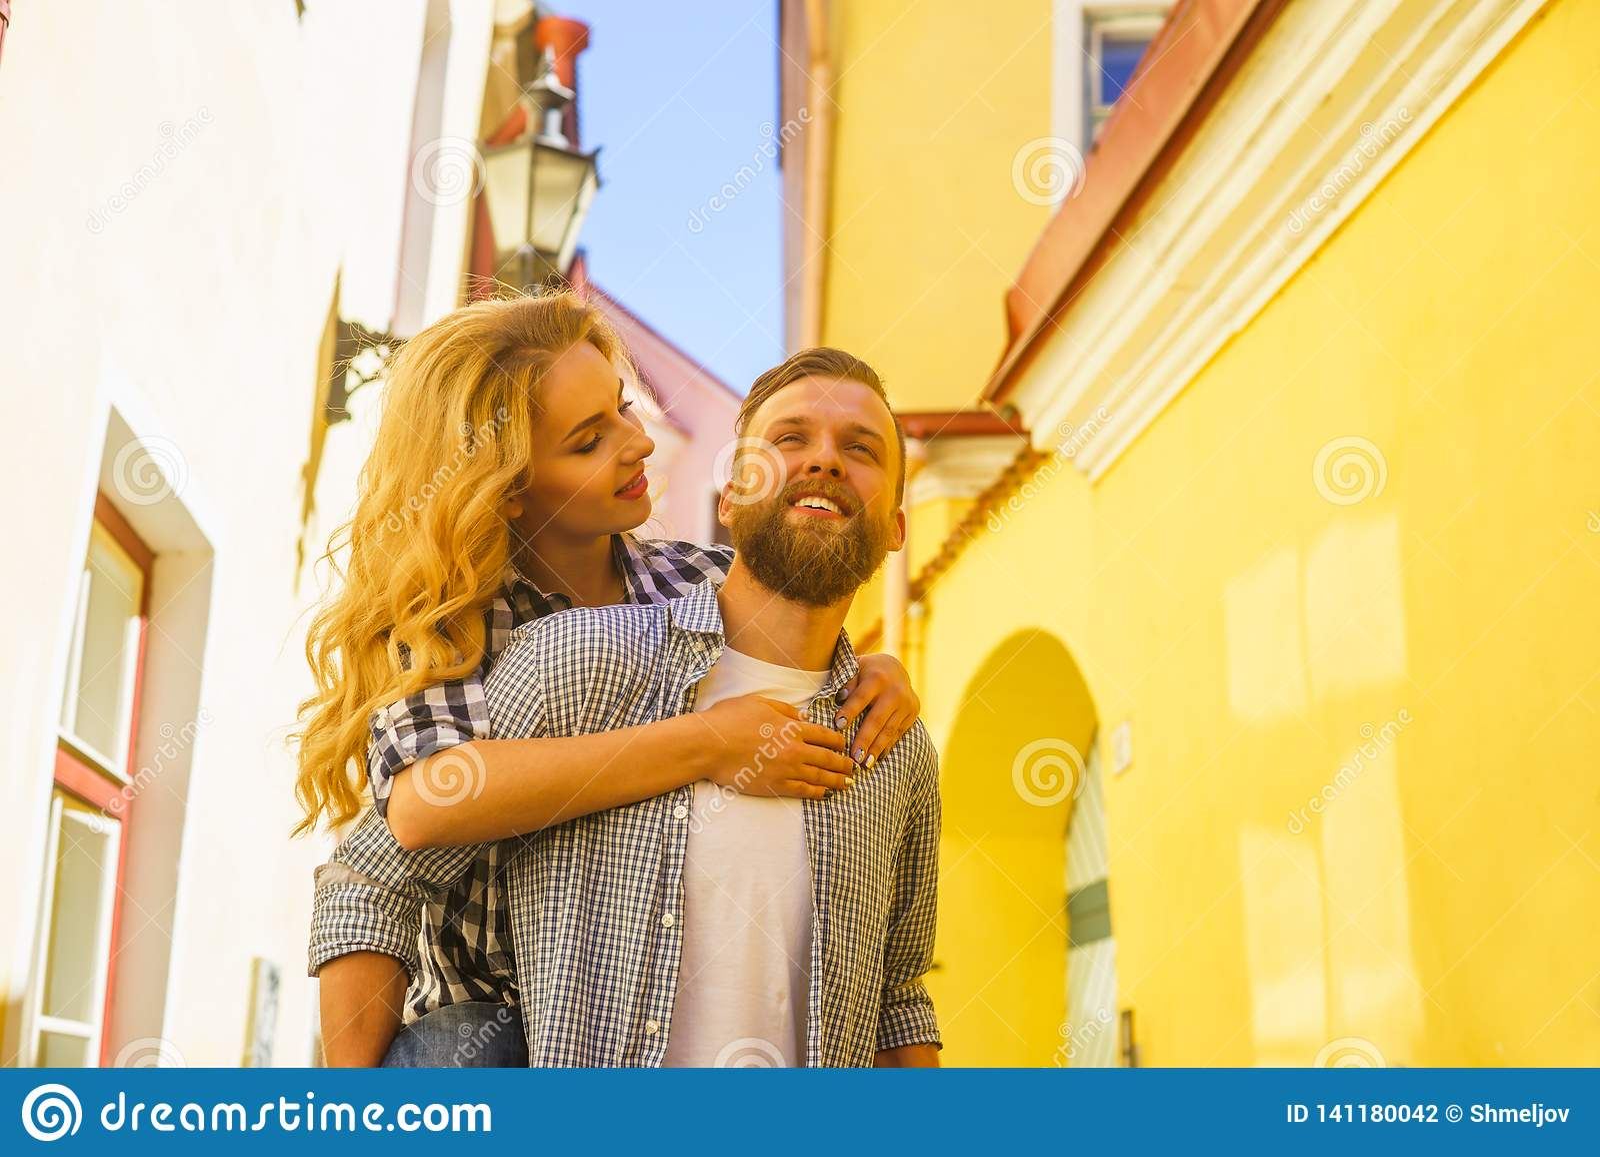 dating sex videos